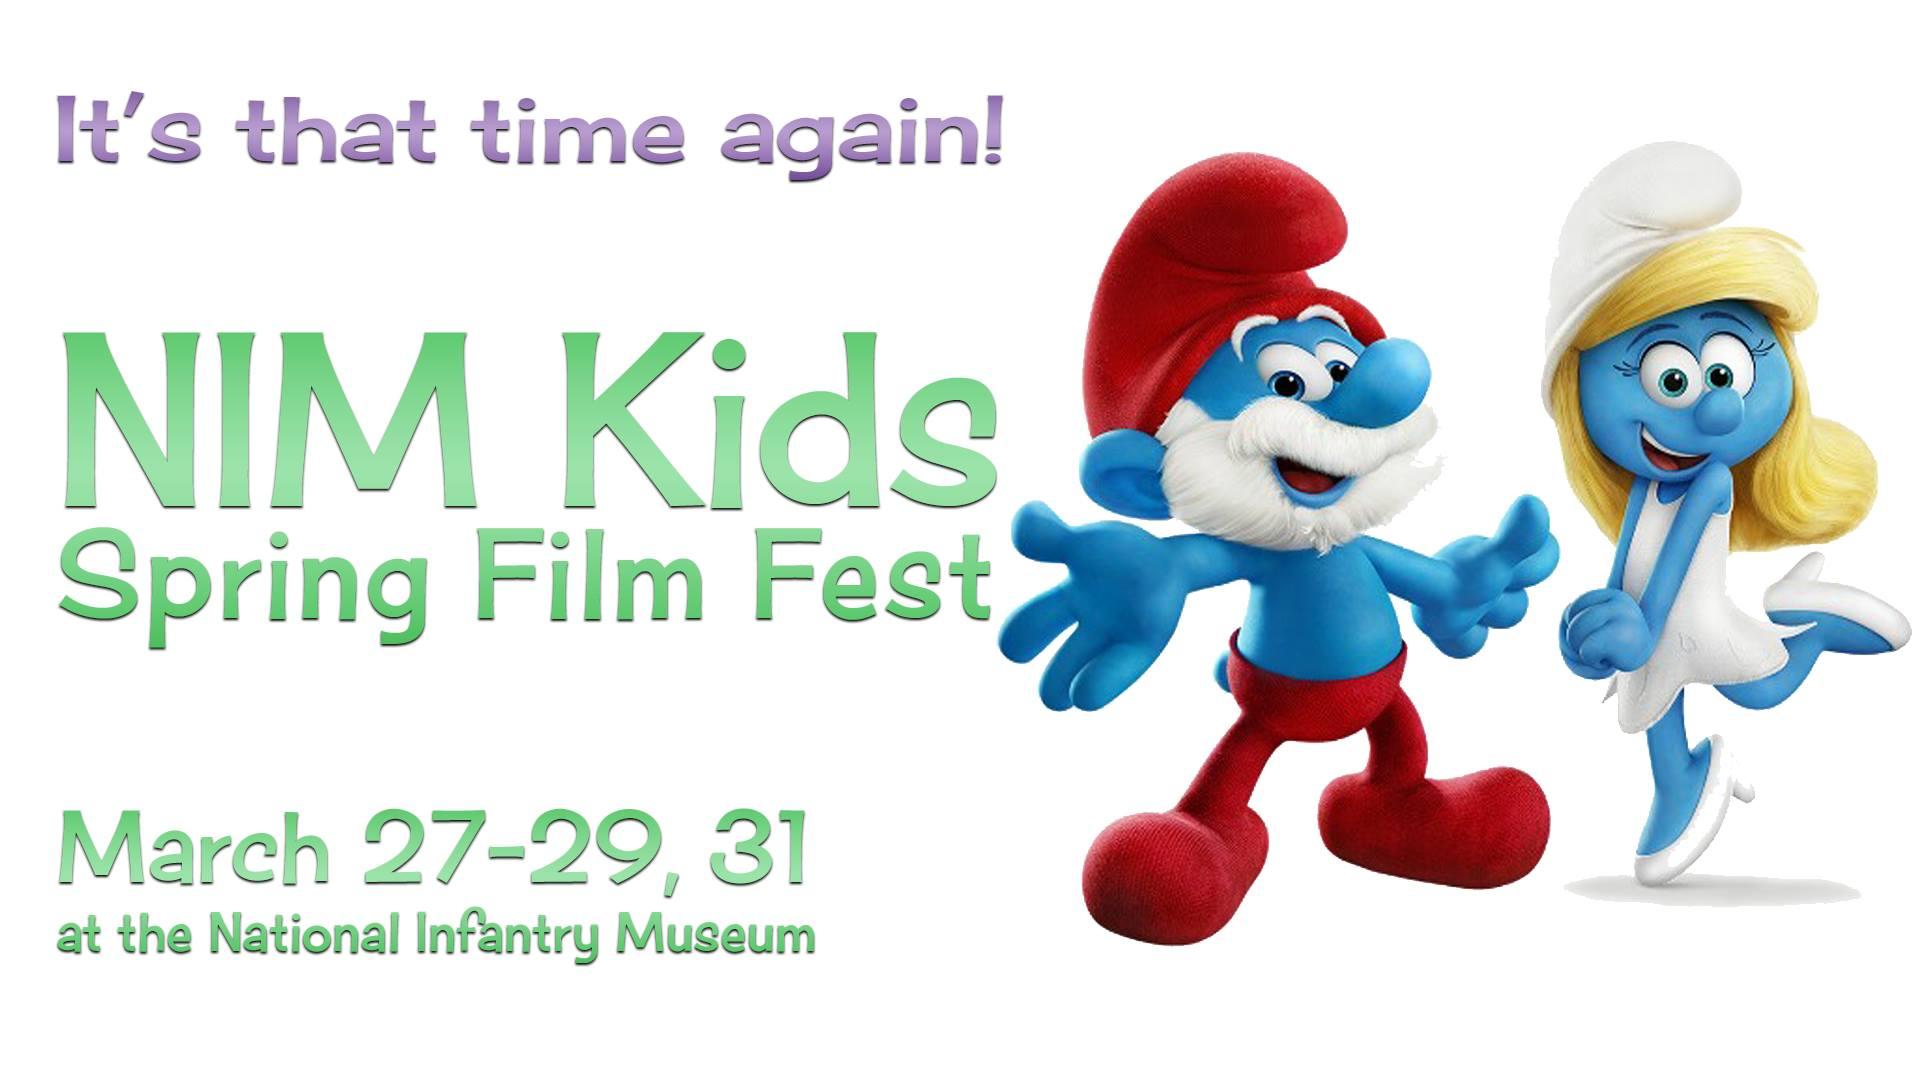 NIM Kids Spring18 Film Fest